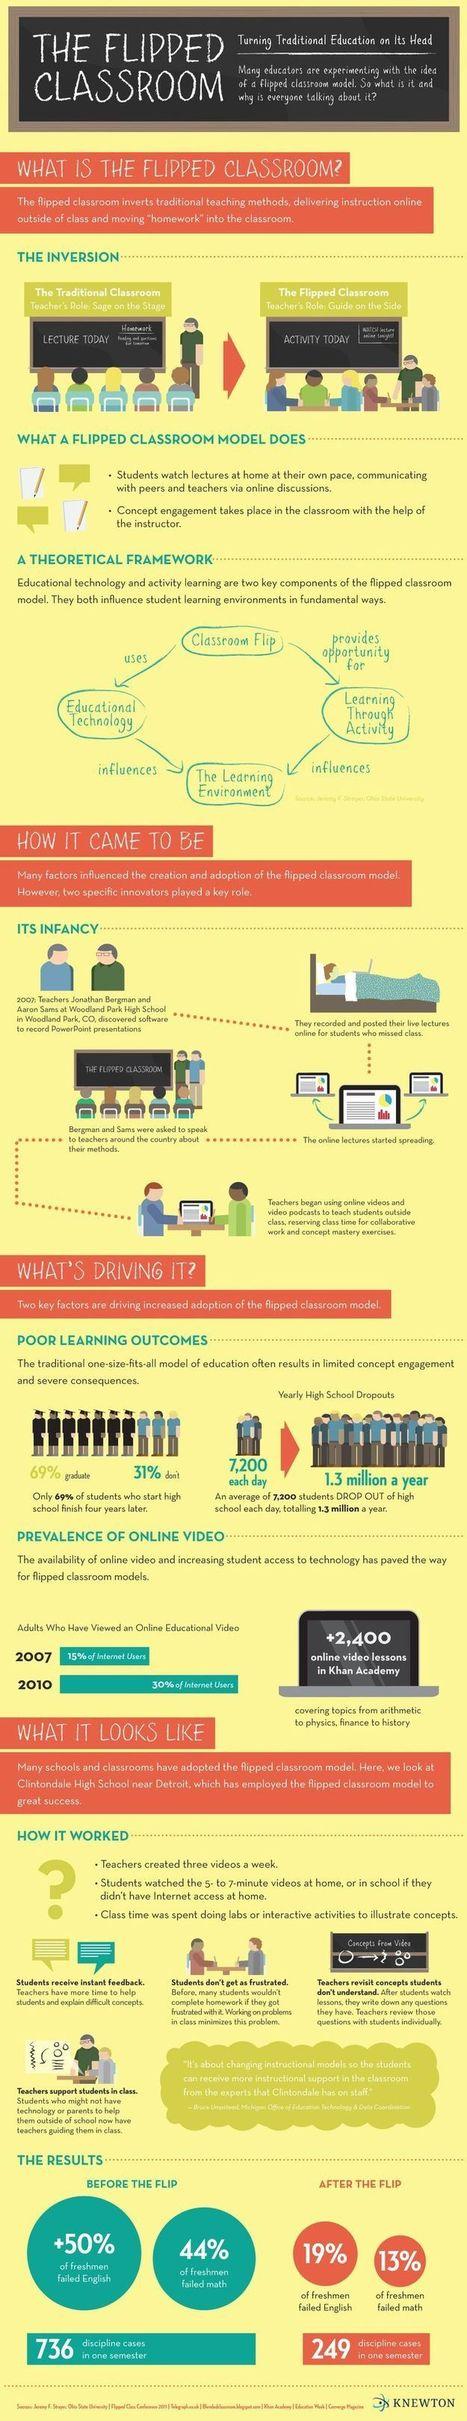 The Flipped Classroom infographic | Tendencias en educación | Scoop.it